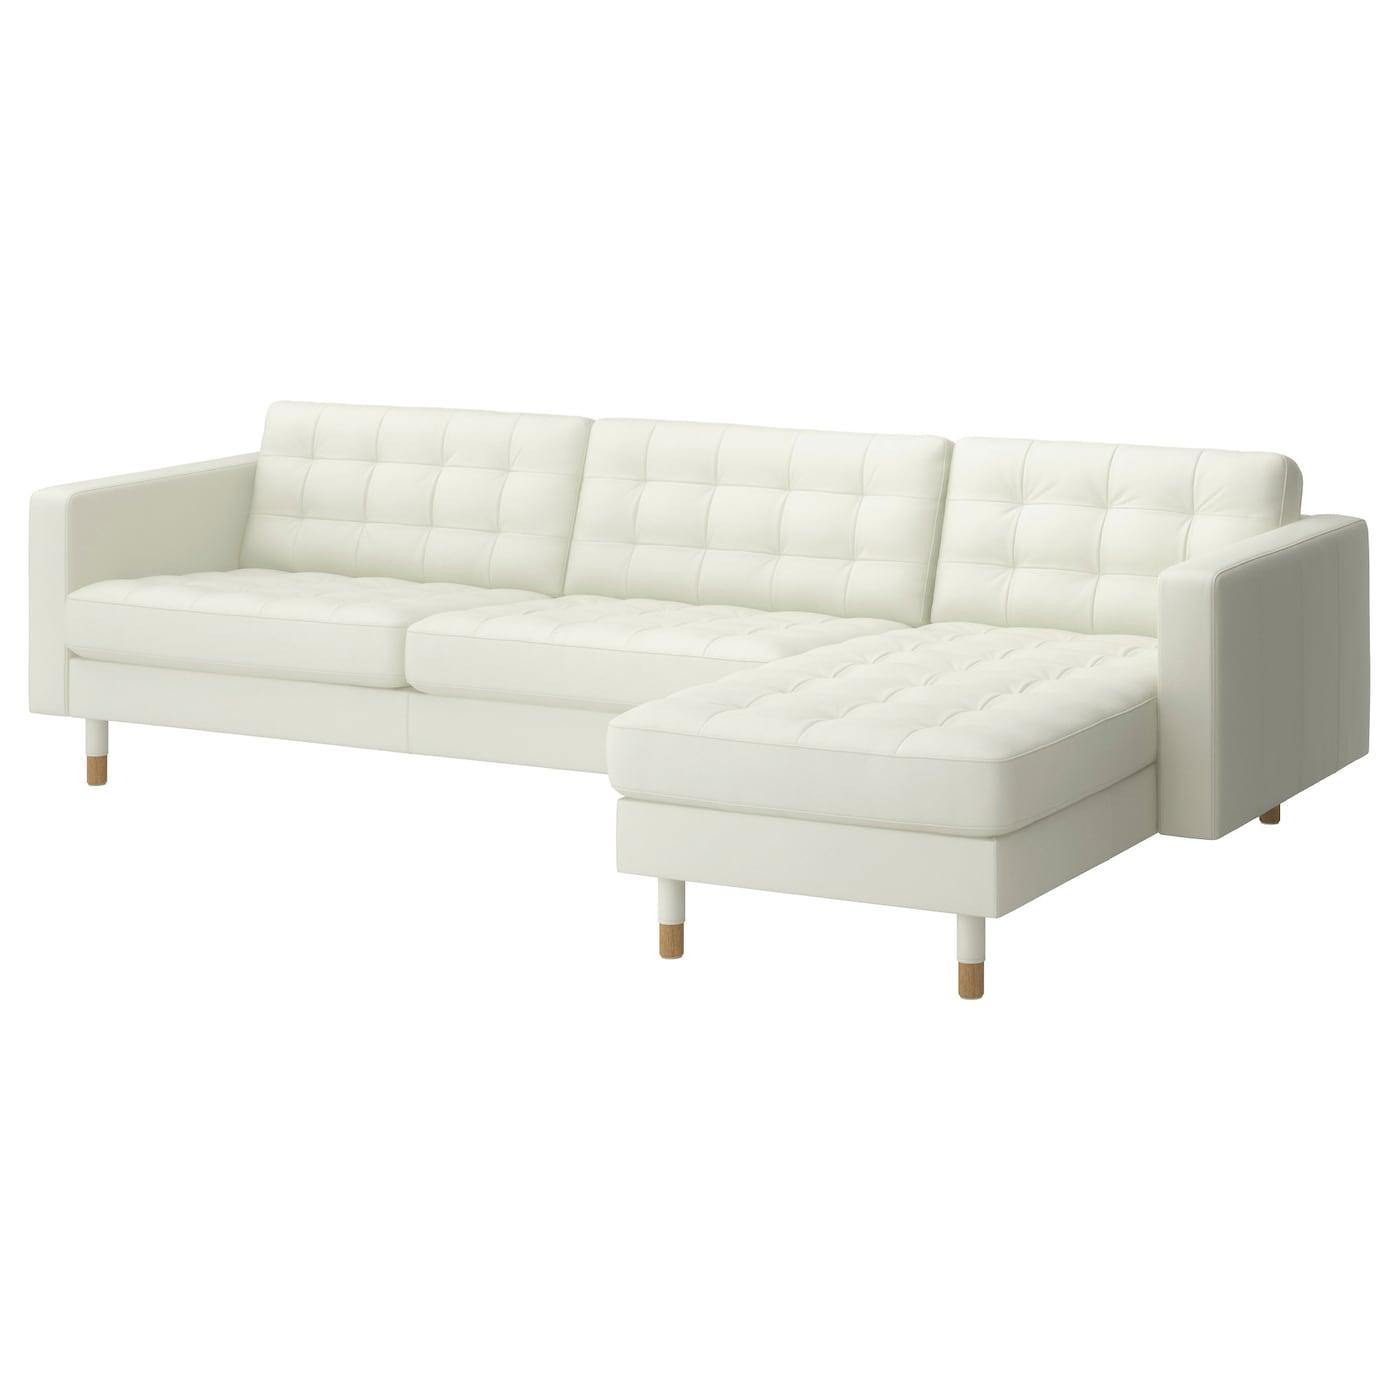 Landskrona 4 seat sofa with chaise longue grann bomstad white wood ikea - Sofa 4 plazas chaise longue ...